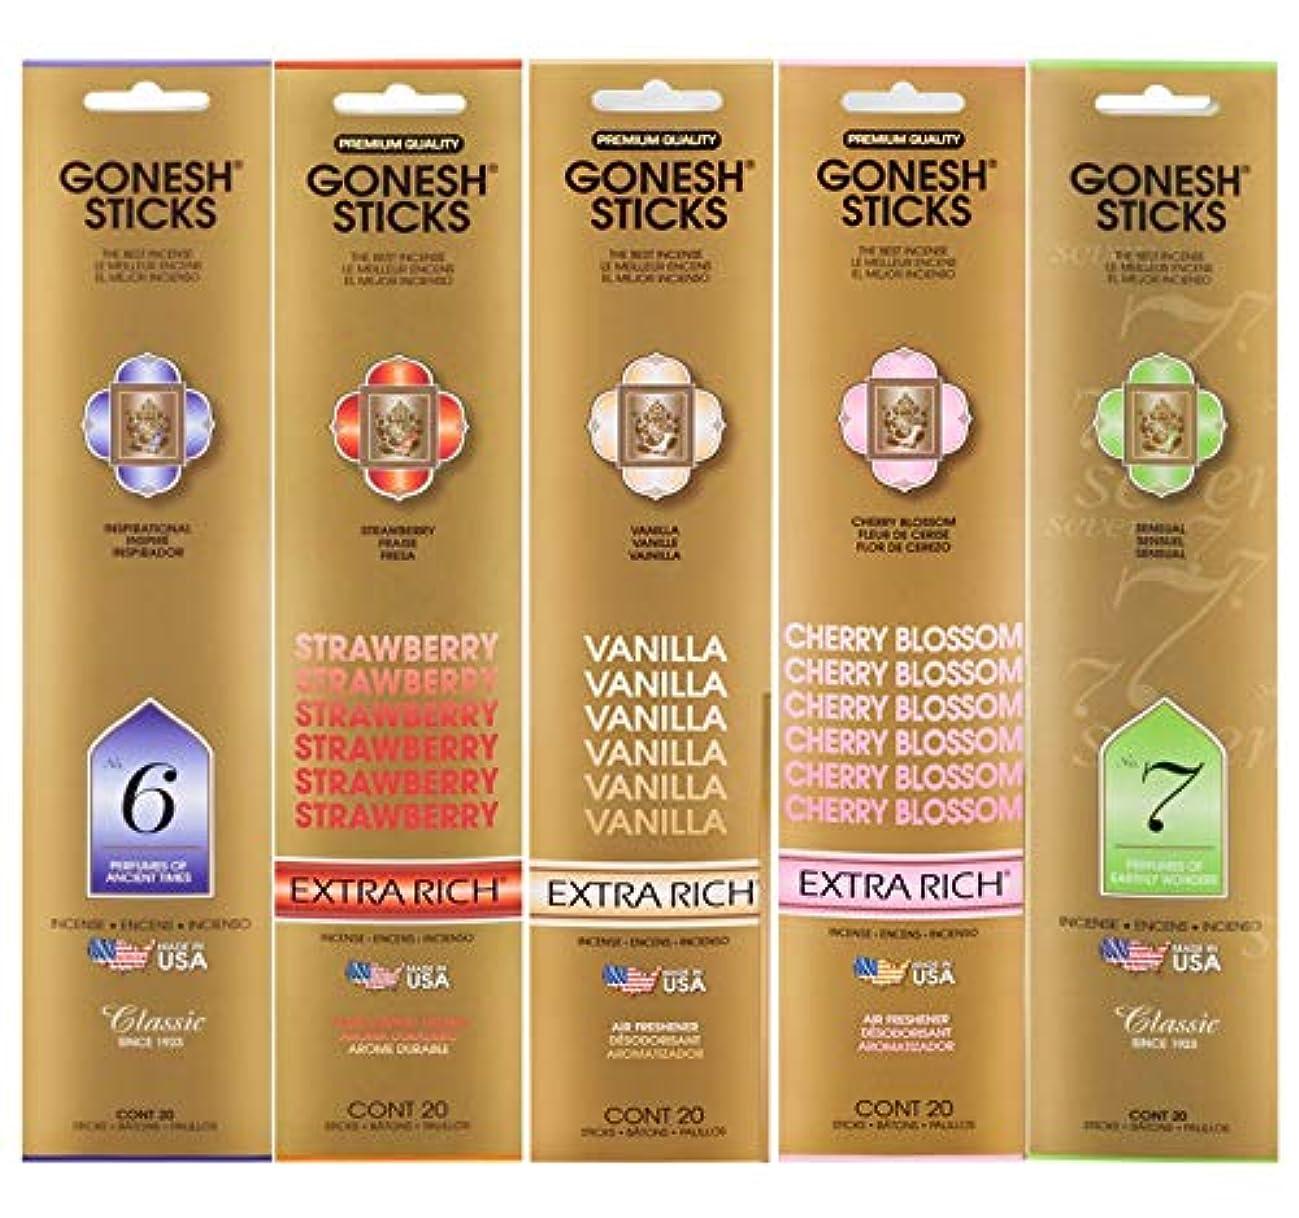 Gonesh Incense Sticksさまざまな値パック( 100 Sticks ) Ancient Times /バニラ/ Cherry Blossom / Earthly Wonders / Strawberry